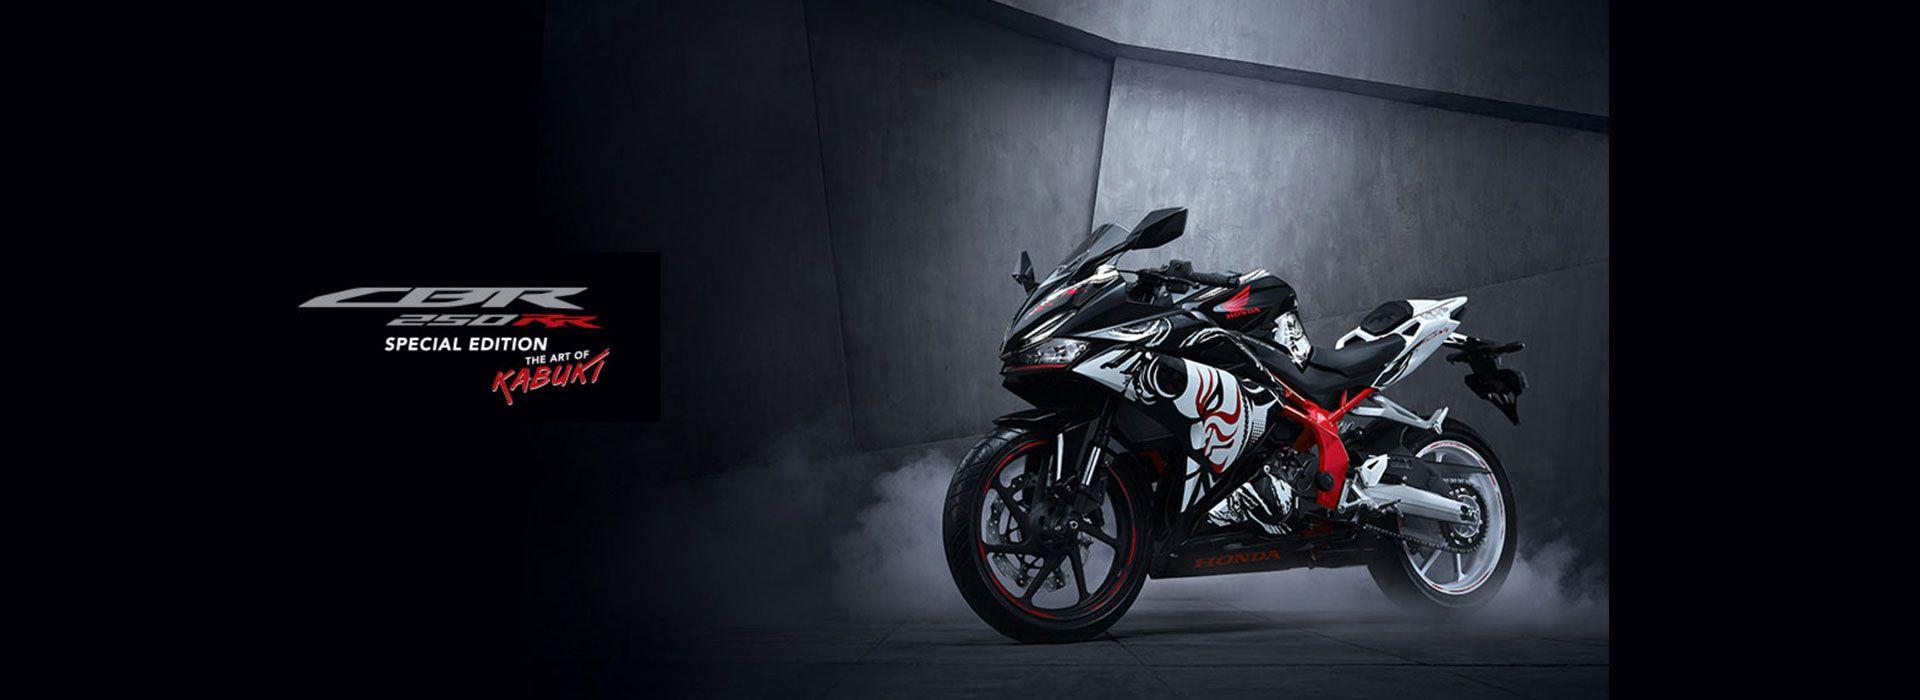 New Honda CBR250RR Special Edition - Tema The Art of Kabuki